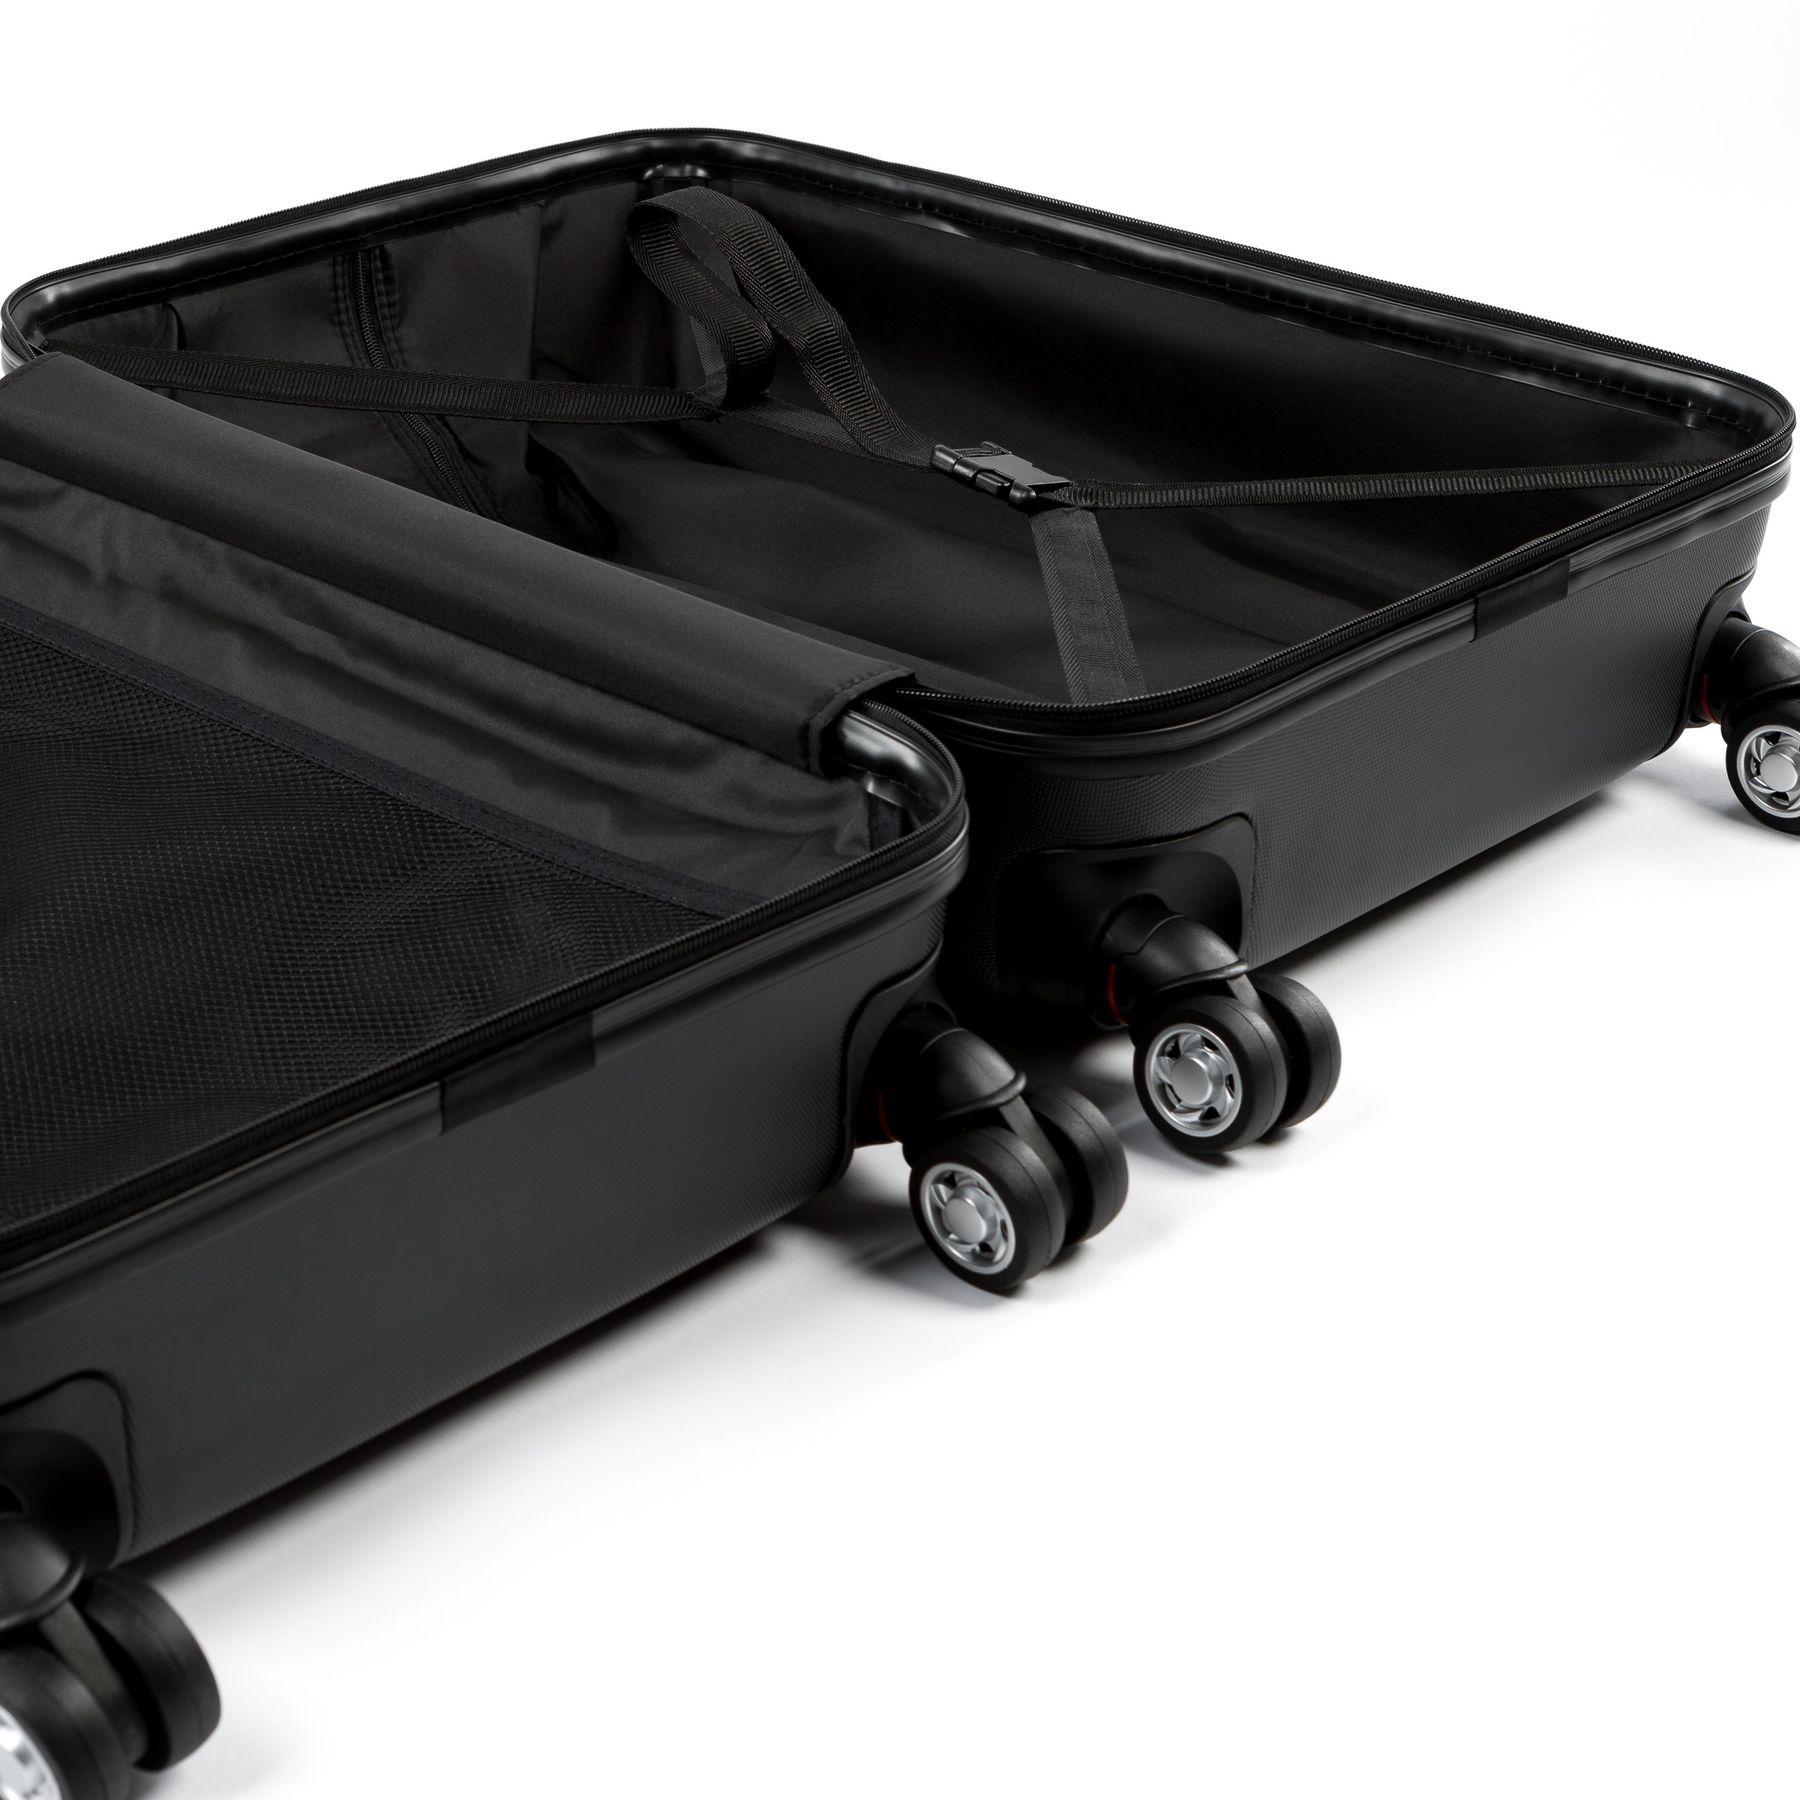 ferg handgep ck 55 cm hartschale lyon schwarz reisekoffer. Black Bedroom Furniture Sets. Home Design Ideas